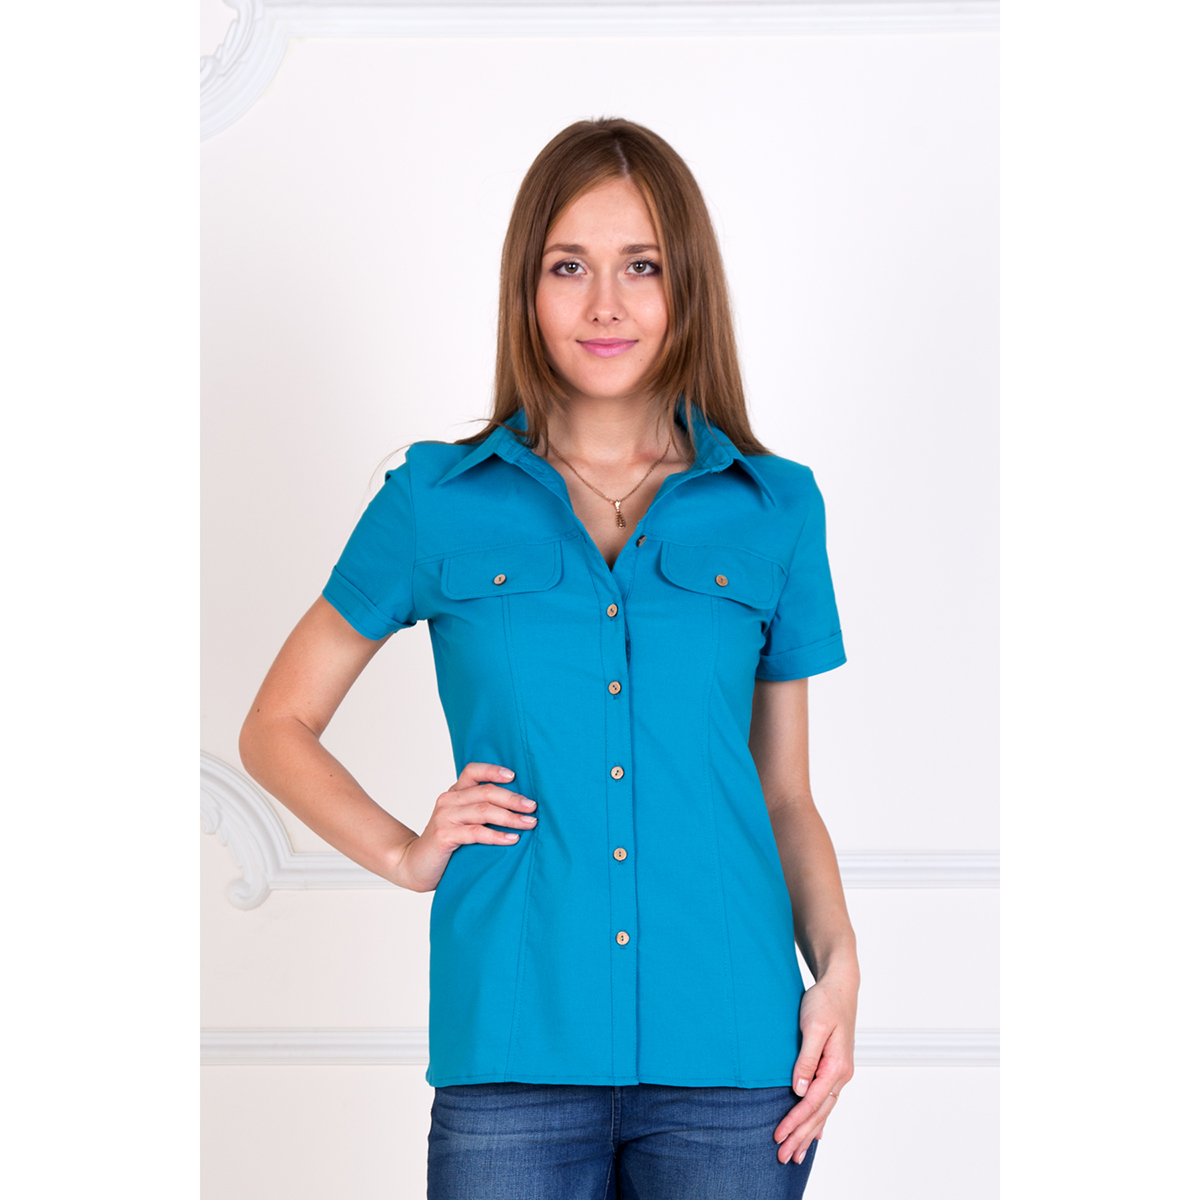 Женская рубашка Александра Голубой, размер 40Рубашки<br>Обхват груди:80 см<br>Обхват талии:62 см<br>Обхват бедер:88 см<br>Рост:167 см<br><br>Тип: Жен. рубашка<br>Размер: 40<br>Материал: Хлопок